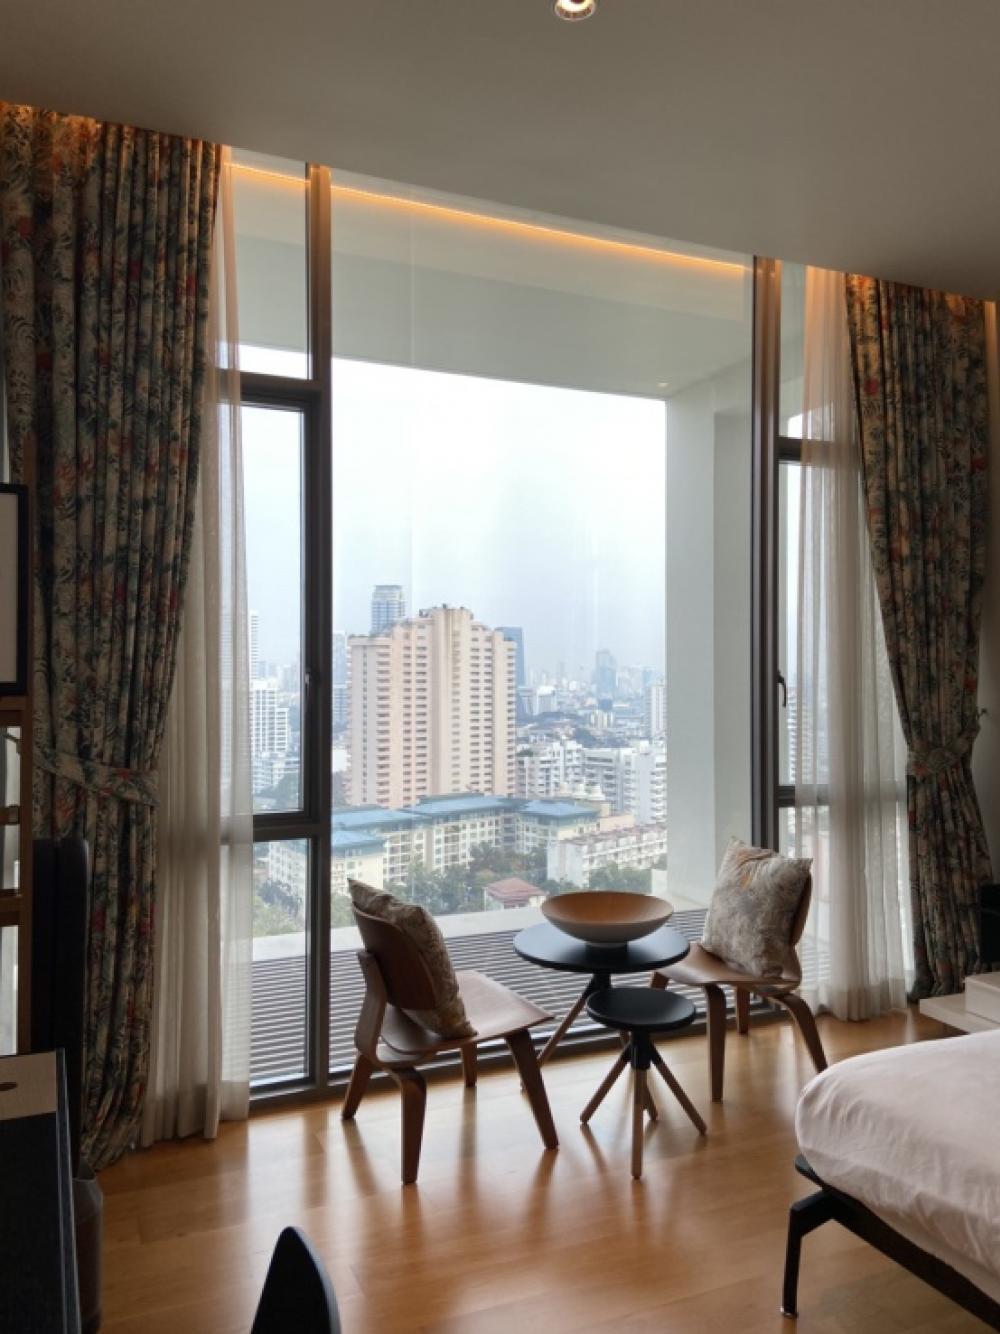 For SaleCondoSathorn, Narathiwat : 🔥ขาย/ให้เช่า  120,000 บาท/เดือน ห้องสวย ราคาดี Sukhothai Residence 🔥